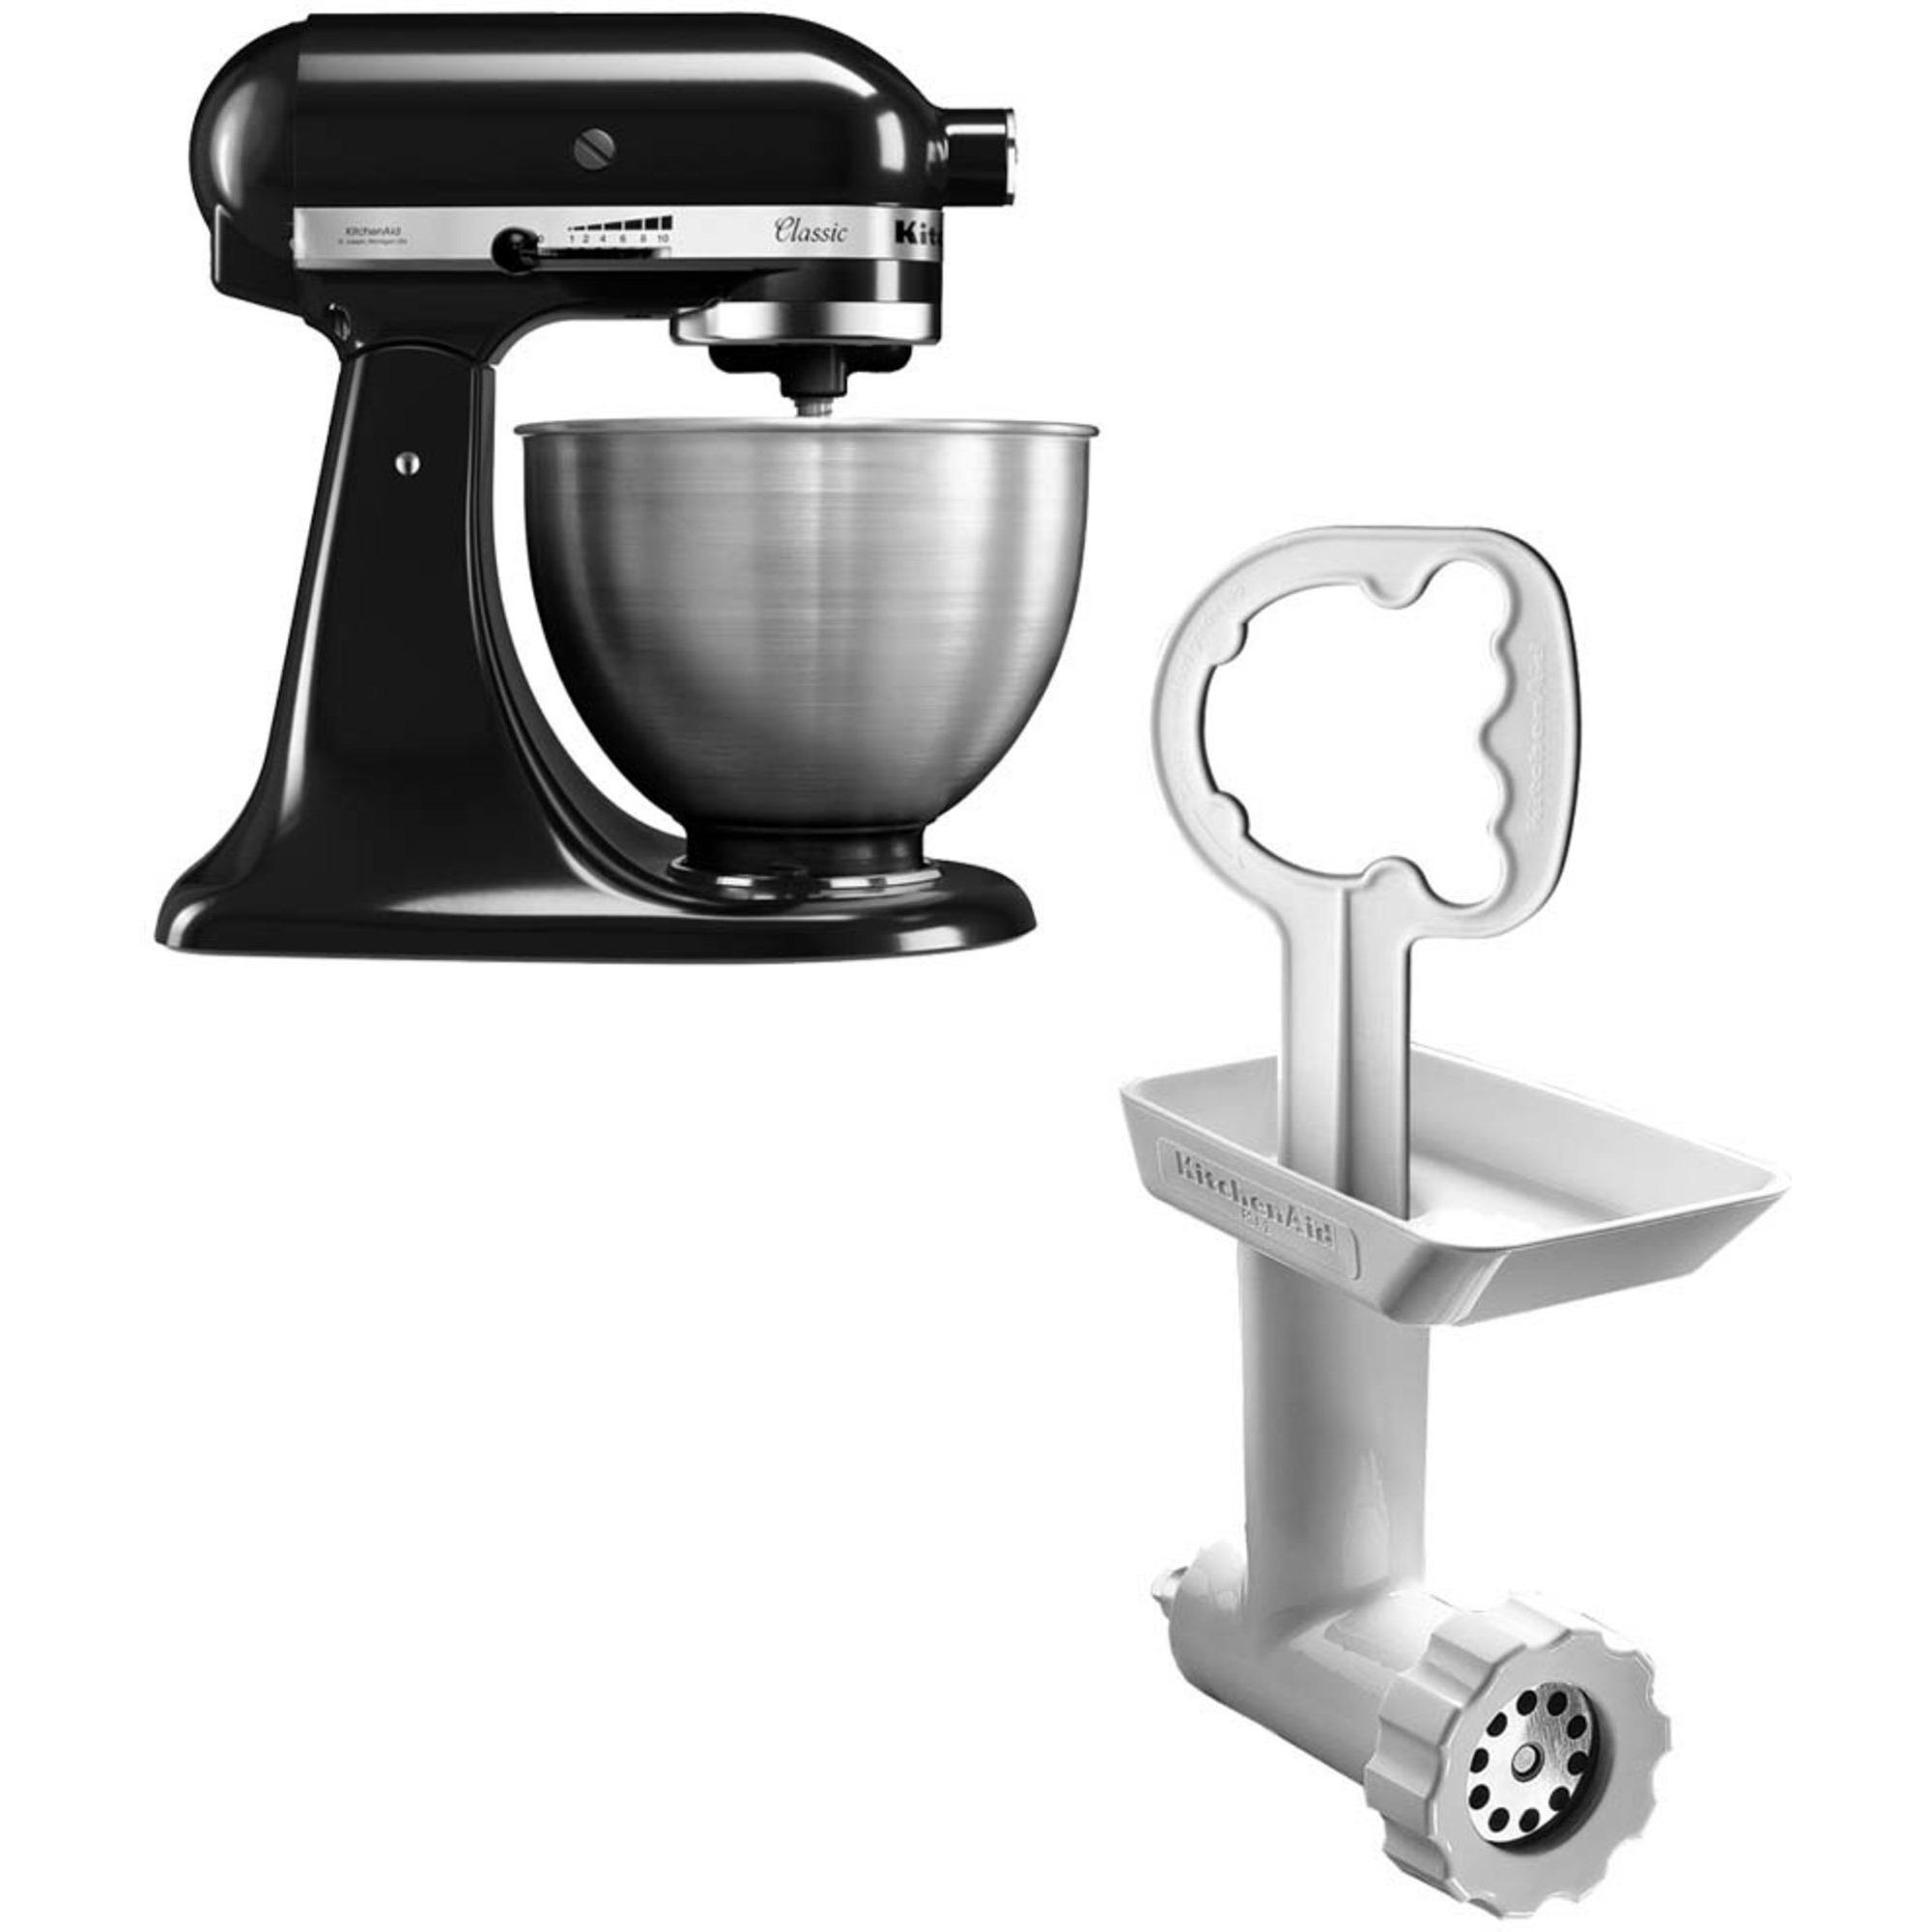 KitchenAid Classic Köksmaskin Svart + Köttkvarn